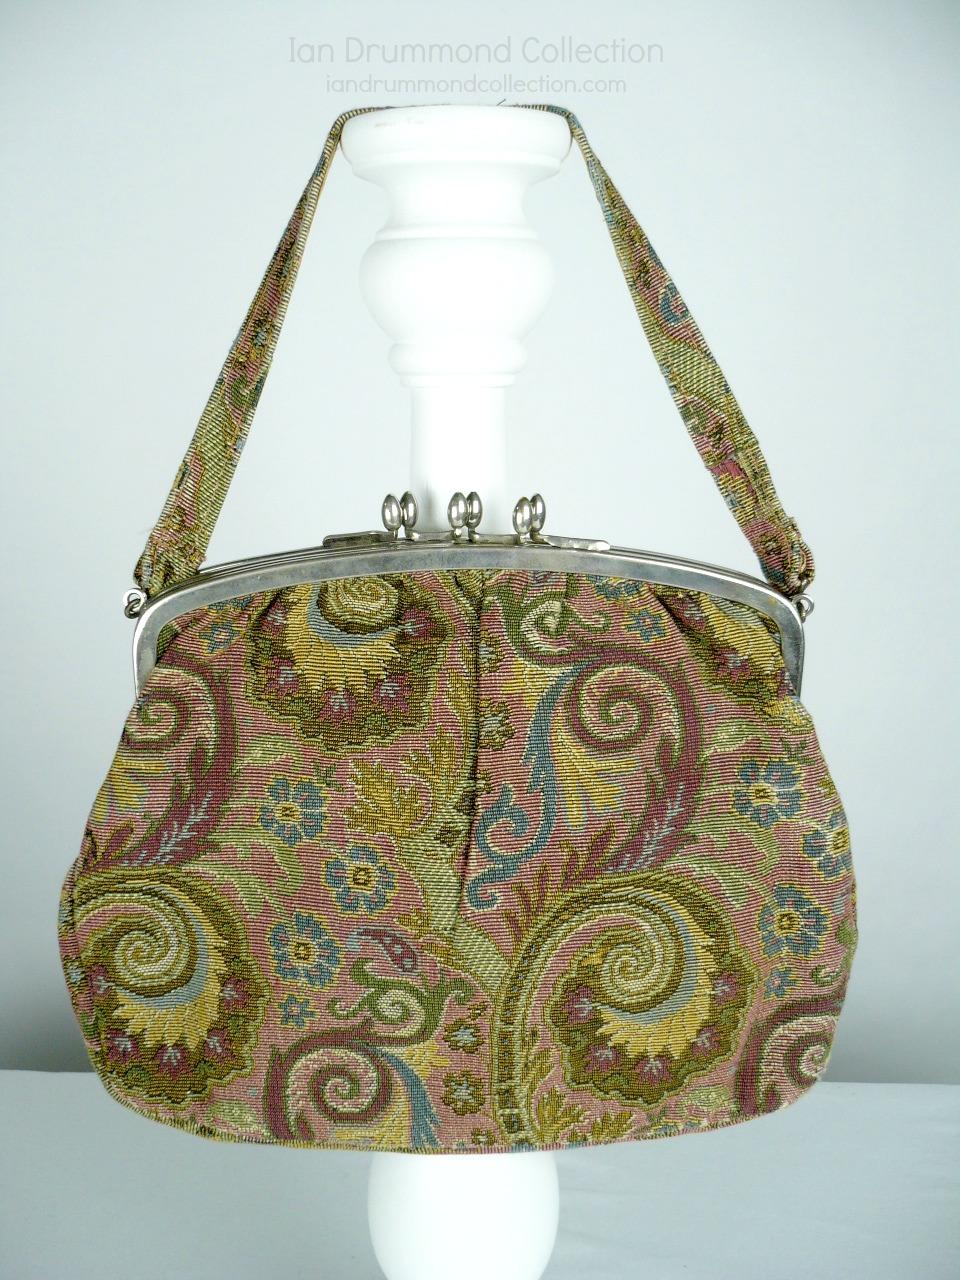 Ian Drummond Collection TV Movie Vintage Clothing Wardrobe Rental Toronto 1930s purse 12 (1)